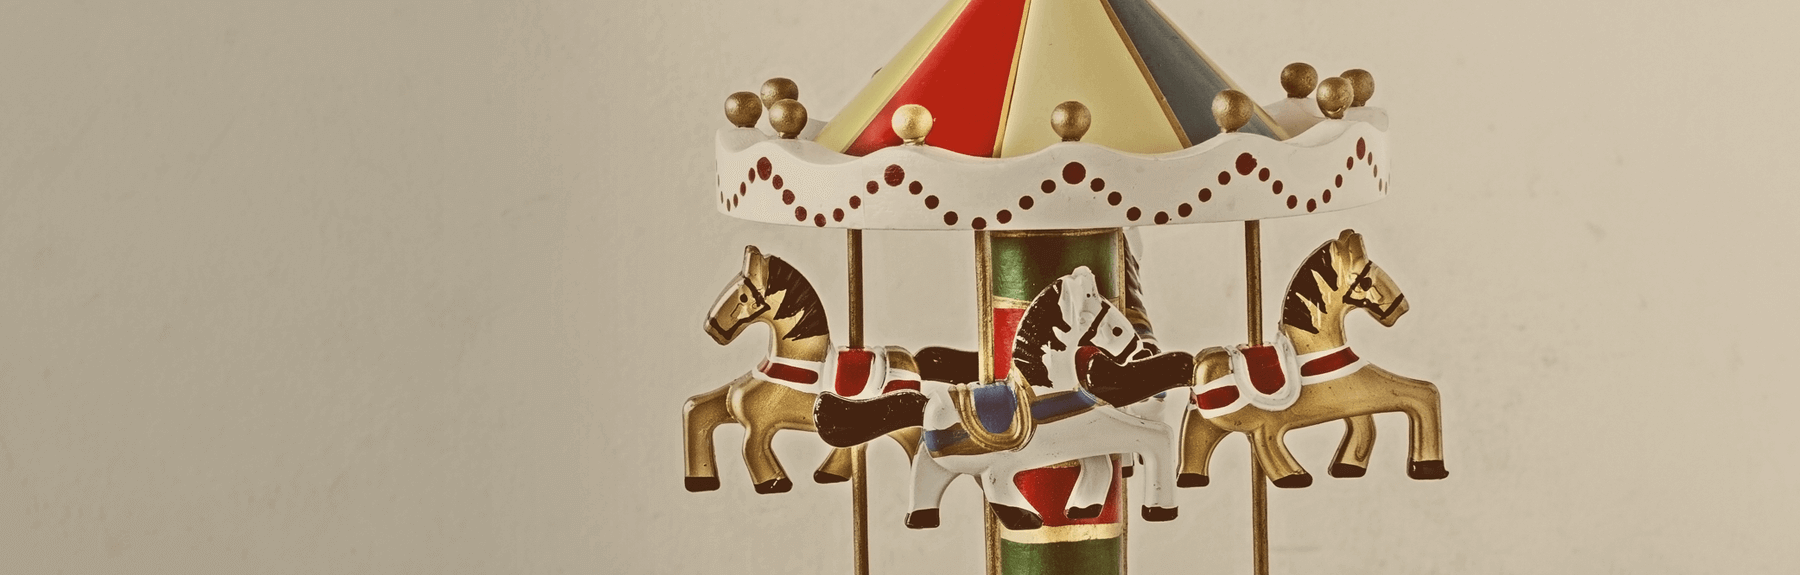 ux-alternatives-rotating-carousels-header-3